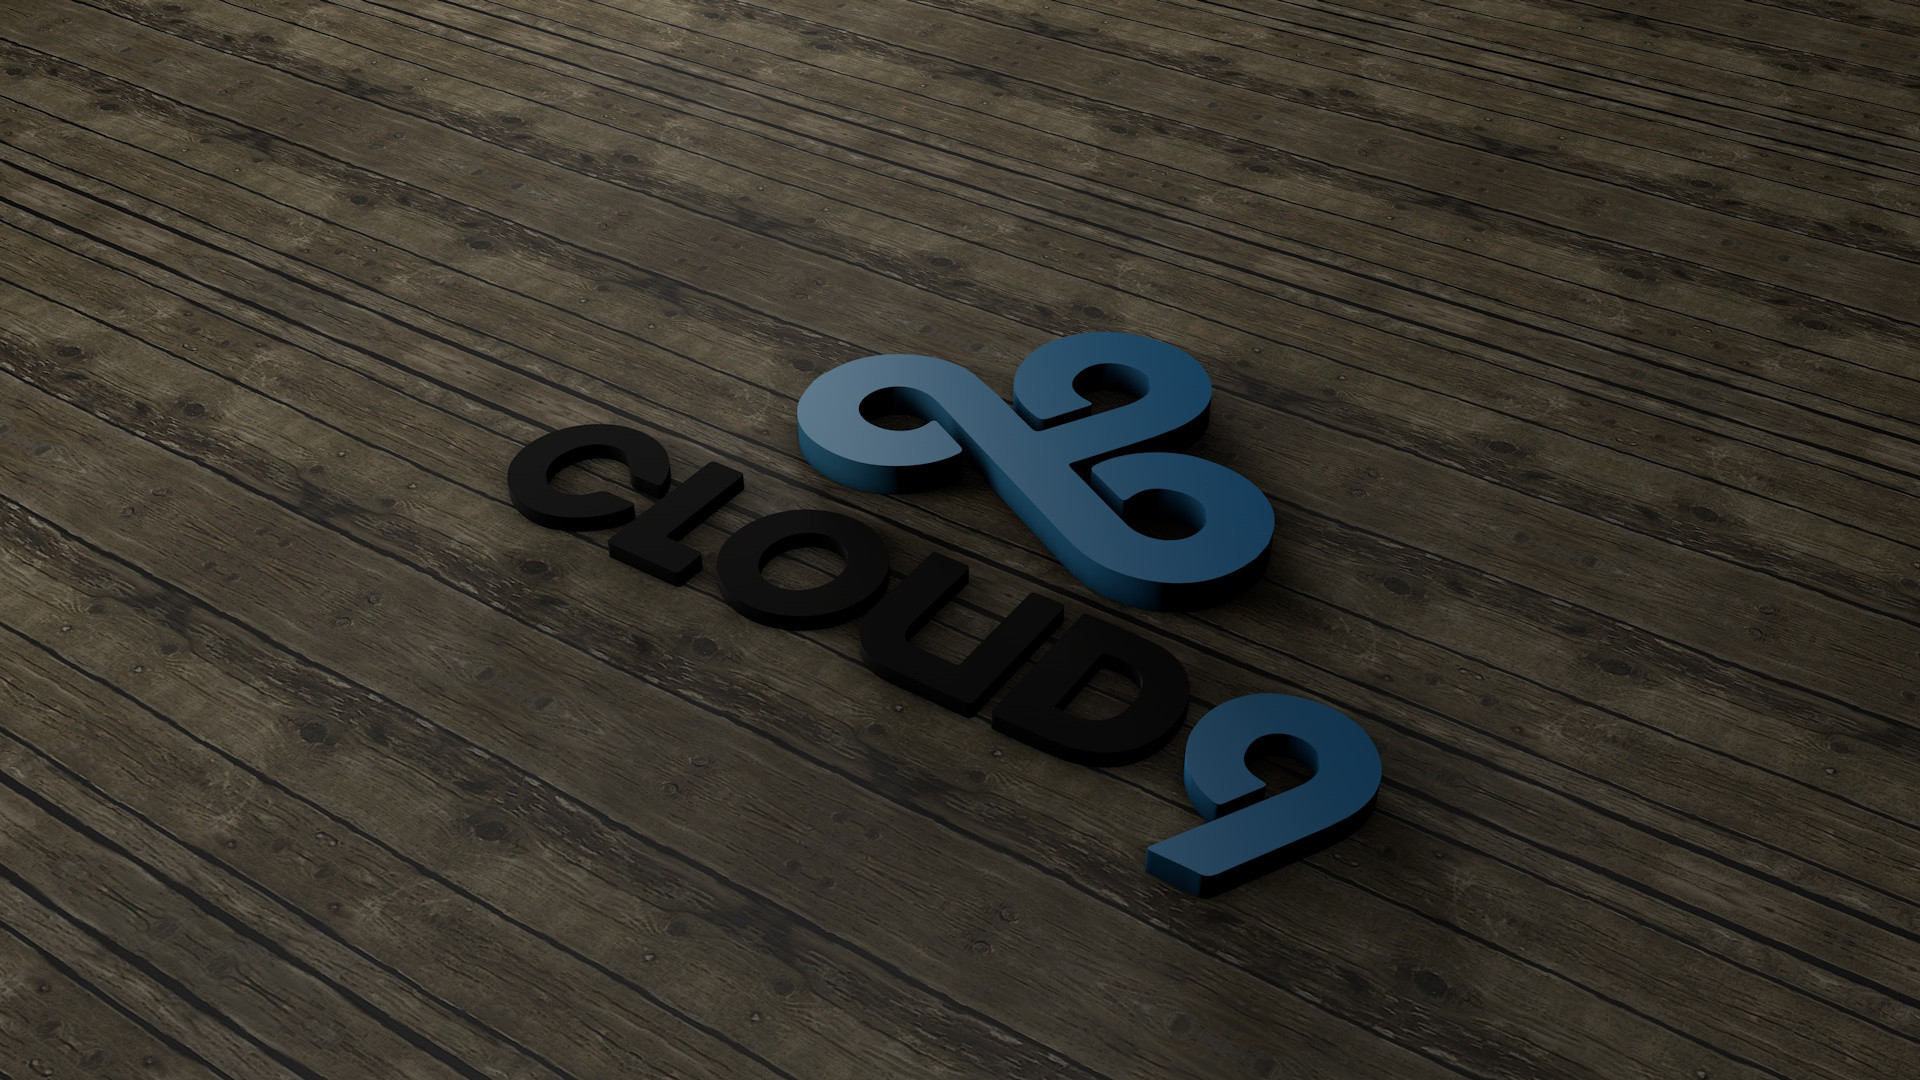 Cloud 9 wallpaper for the fans! : GlobalOffensive